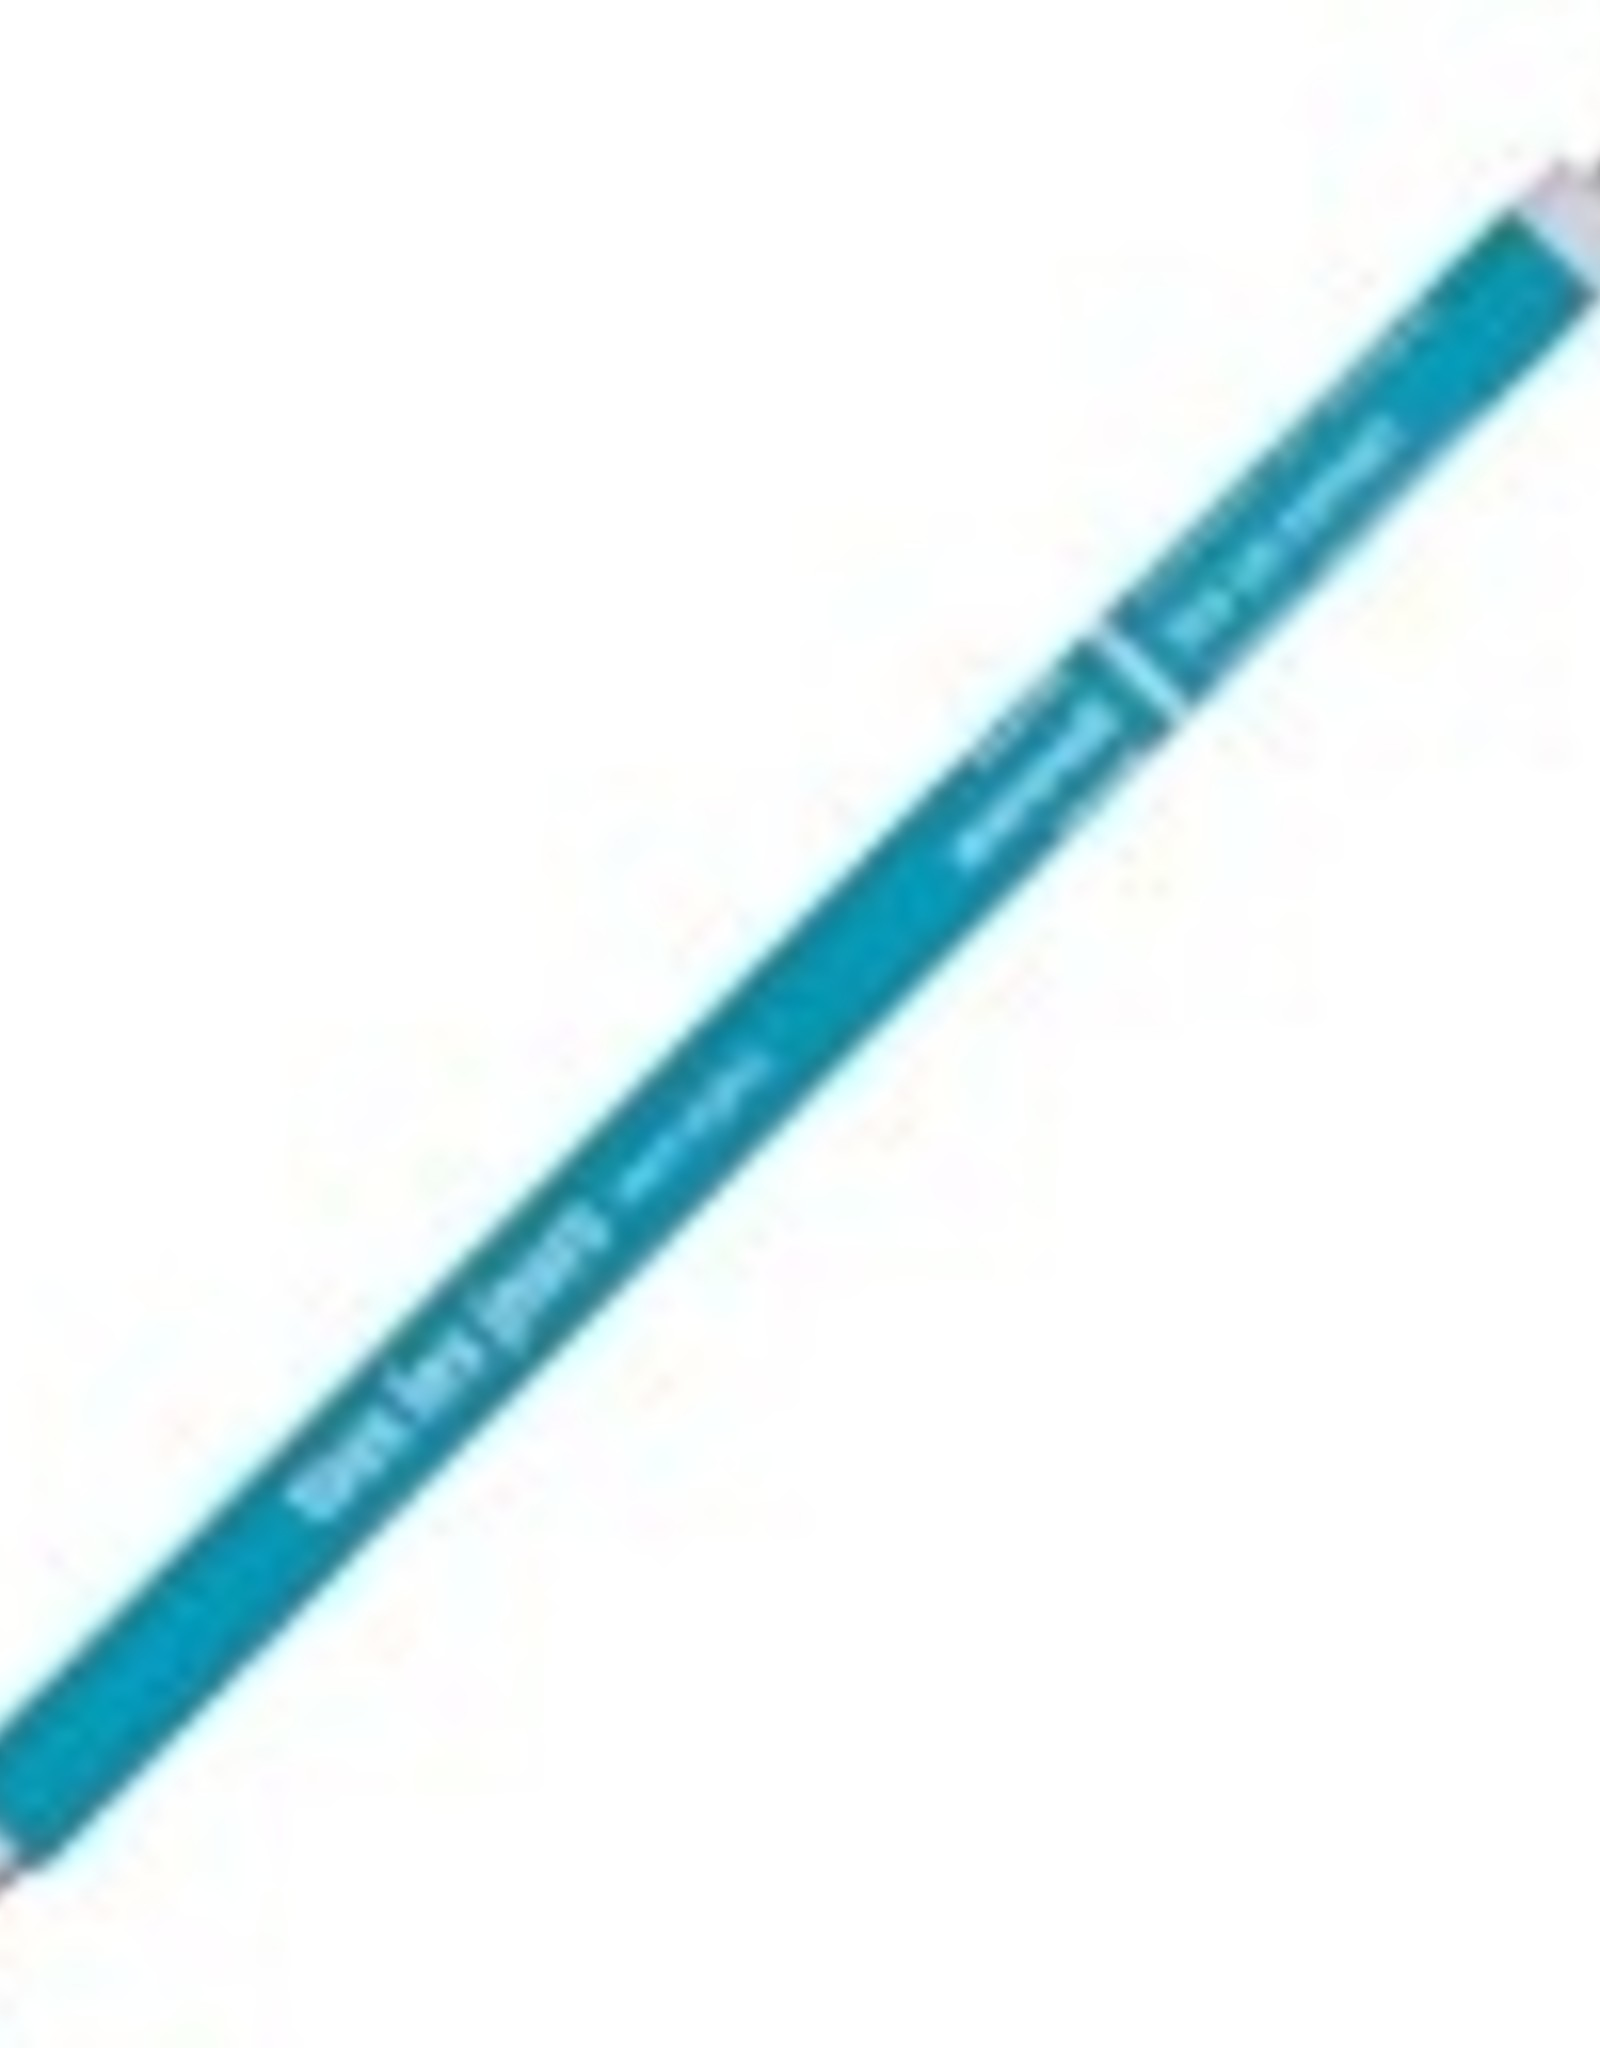 Marks Mark'Style Ballpoint Pen 0.5 mm